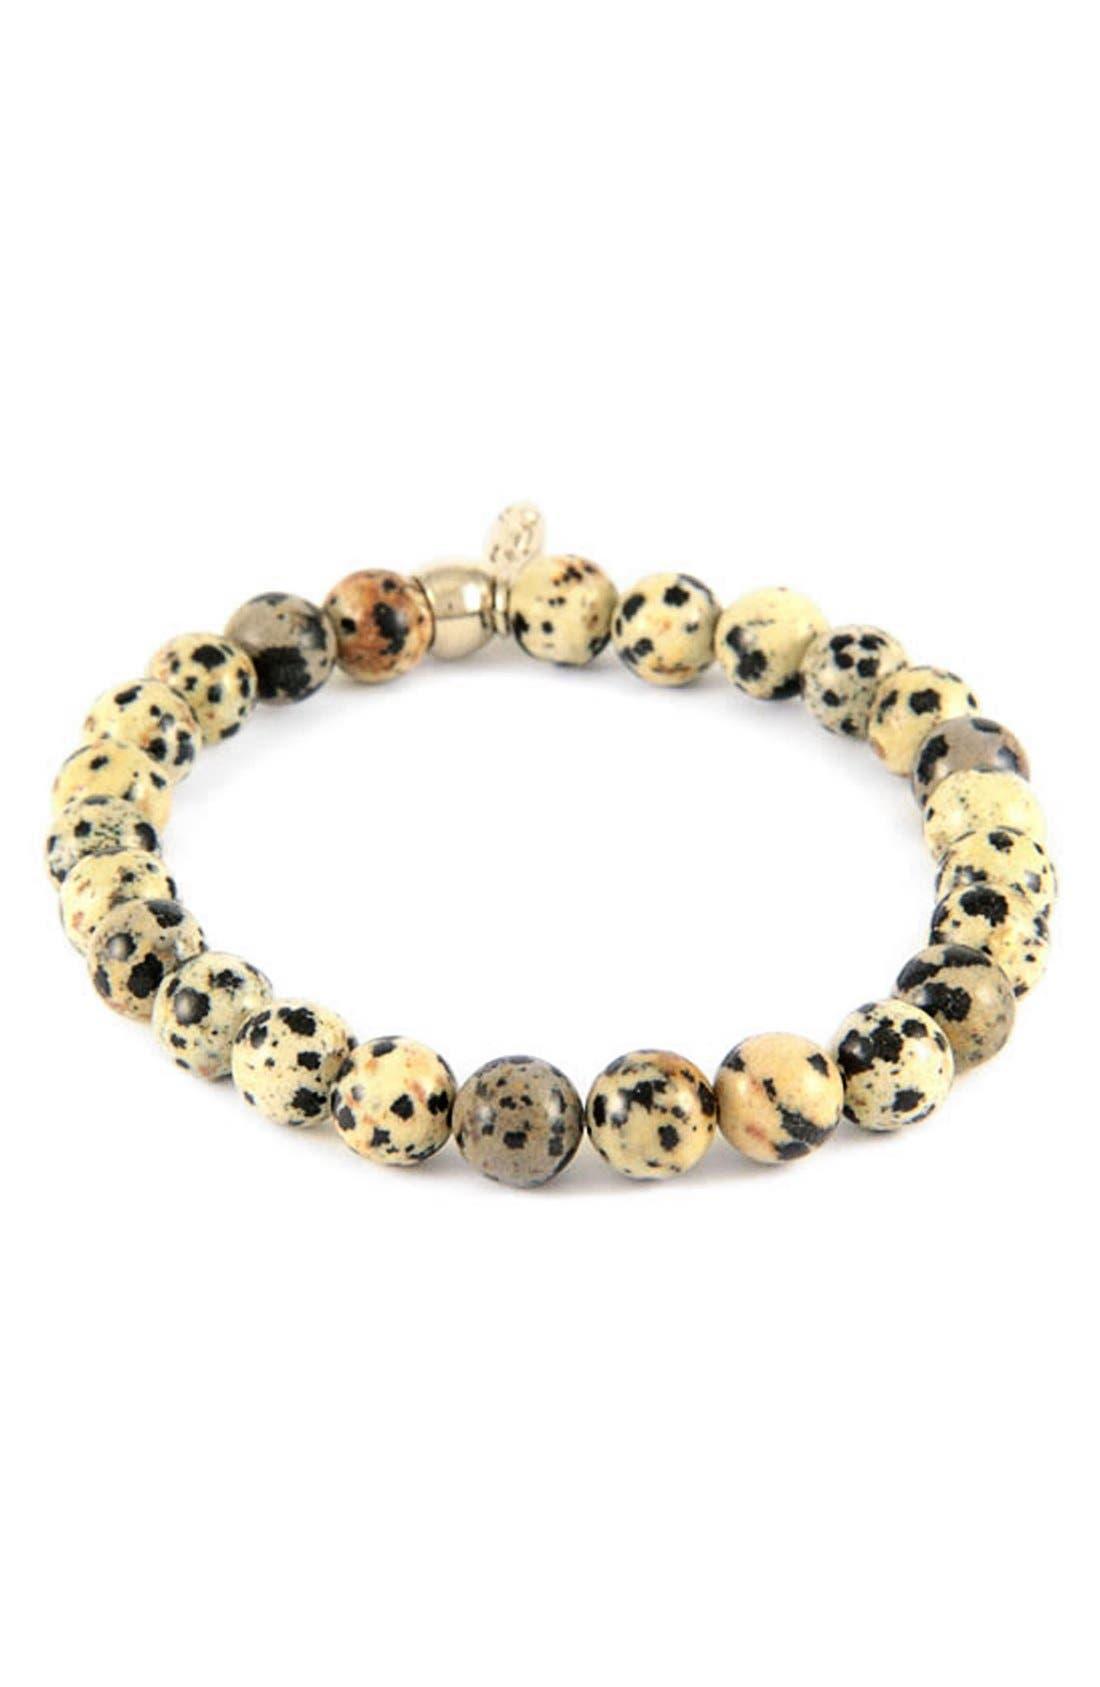 Main Image - Mr. Ettika Dalmatian Jasper Bead Bracelet